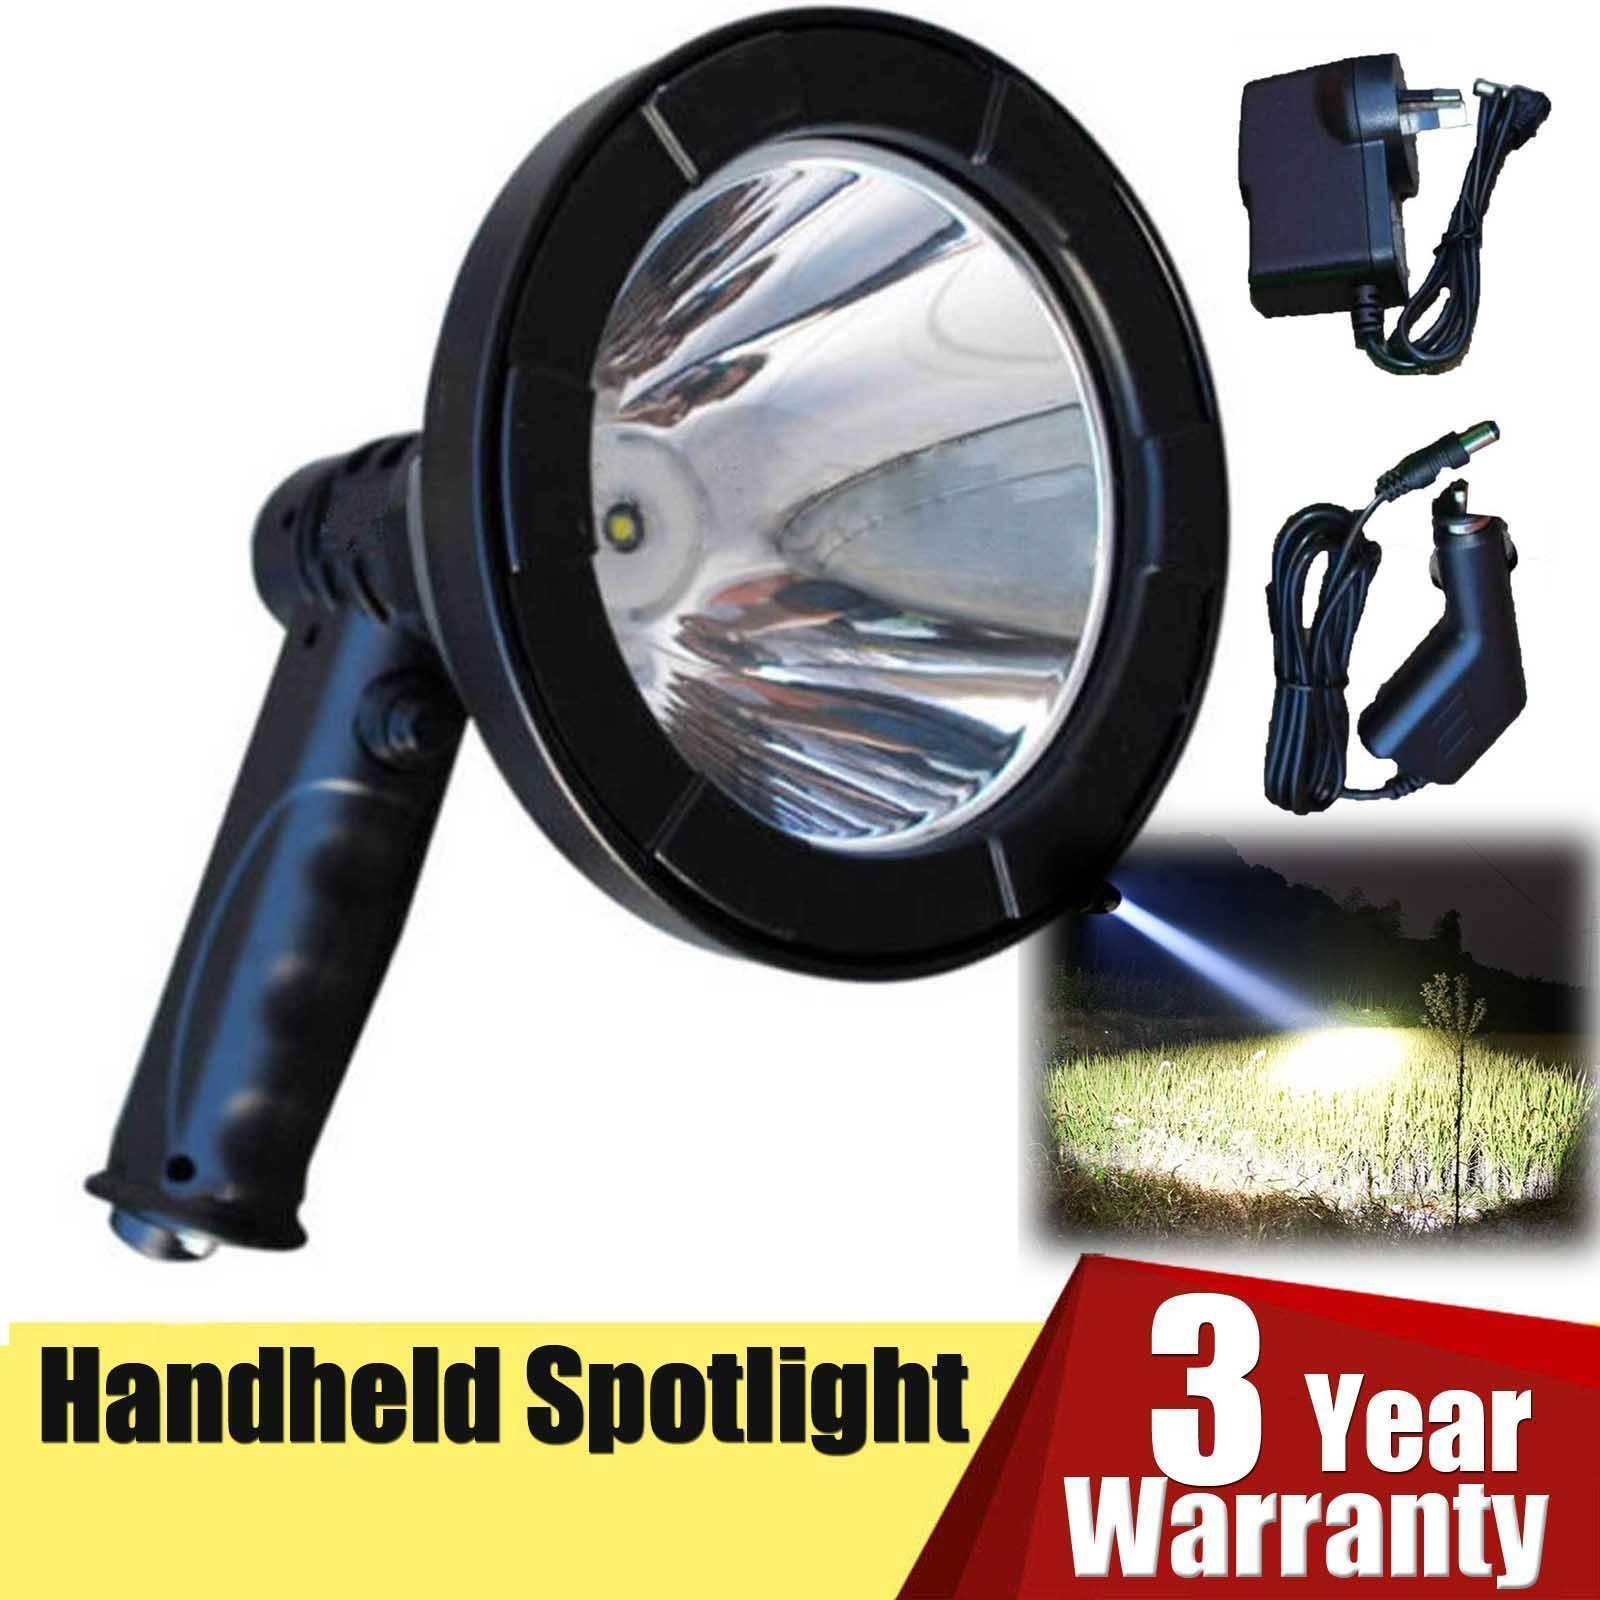 500W CREE LED Spotlight Lamp Torch Lamping Hunting Shooting Fishing 125mm 12V